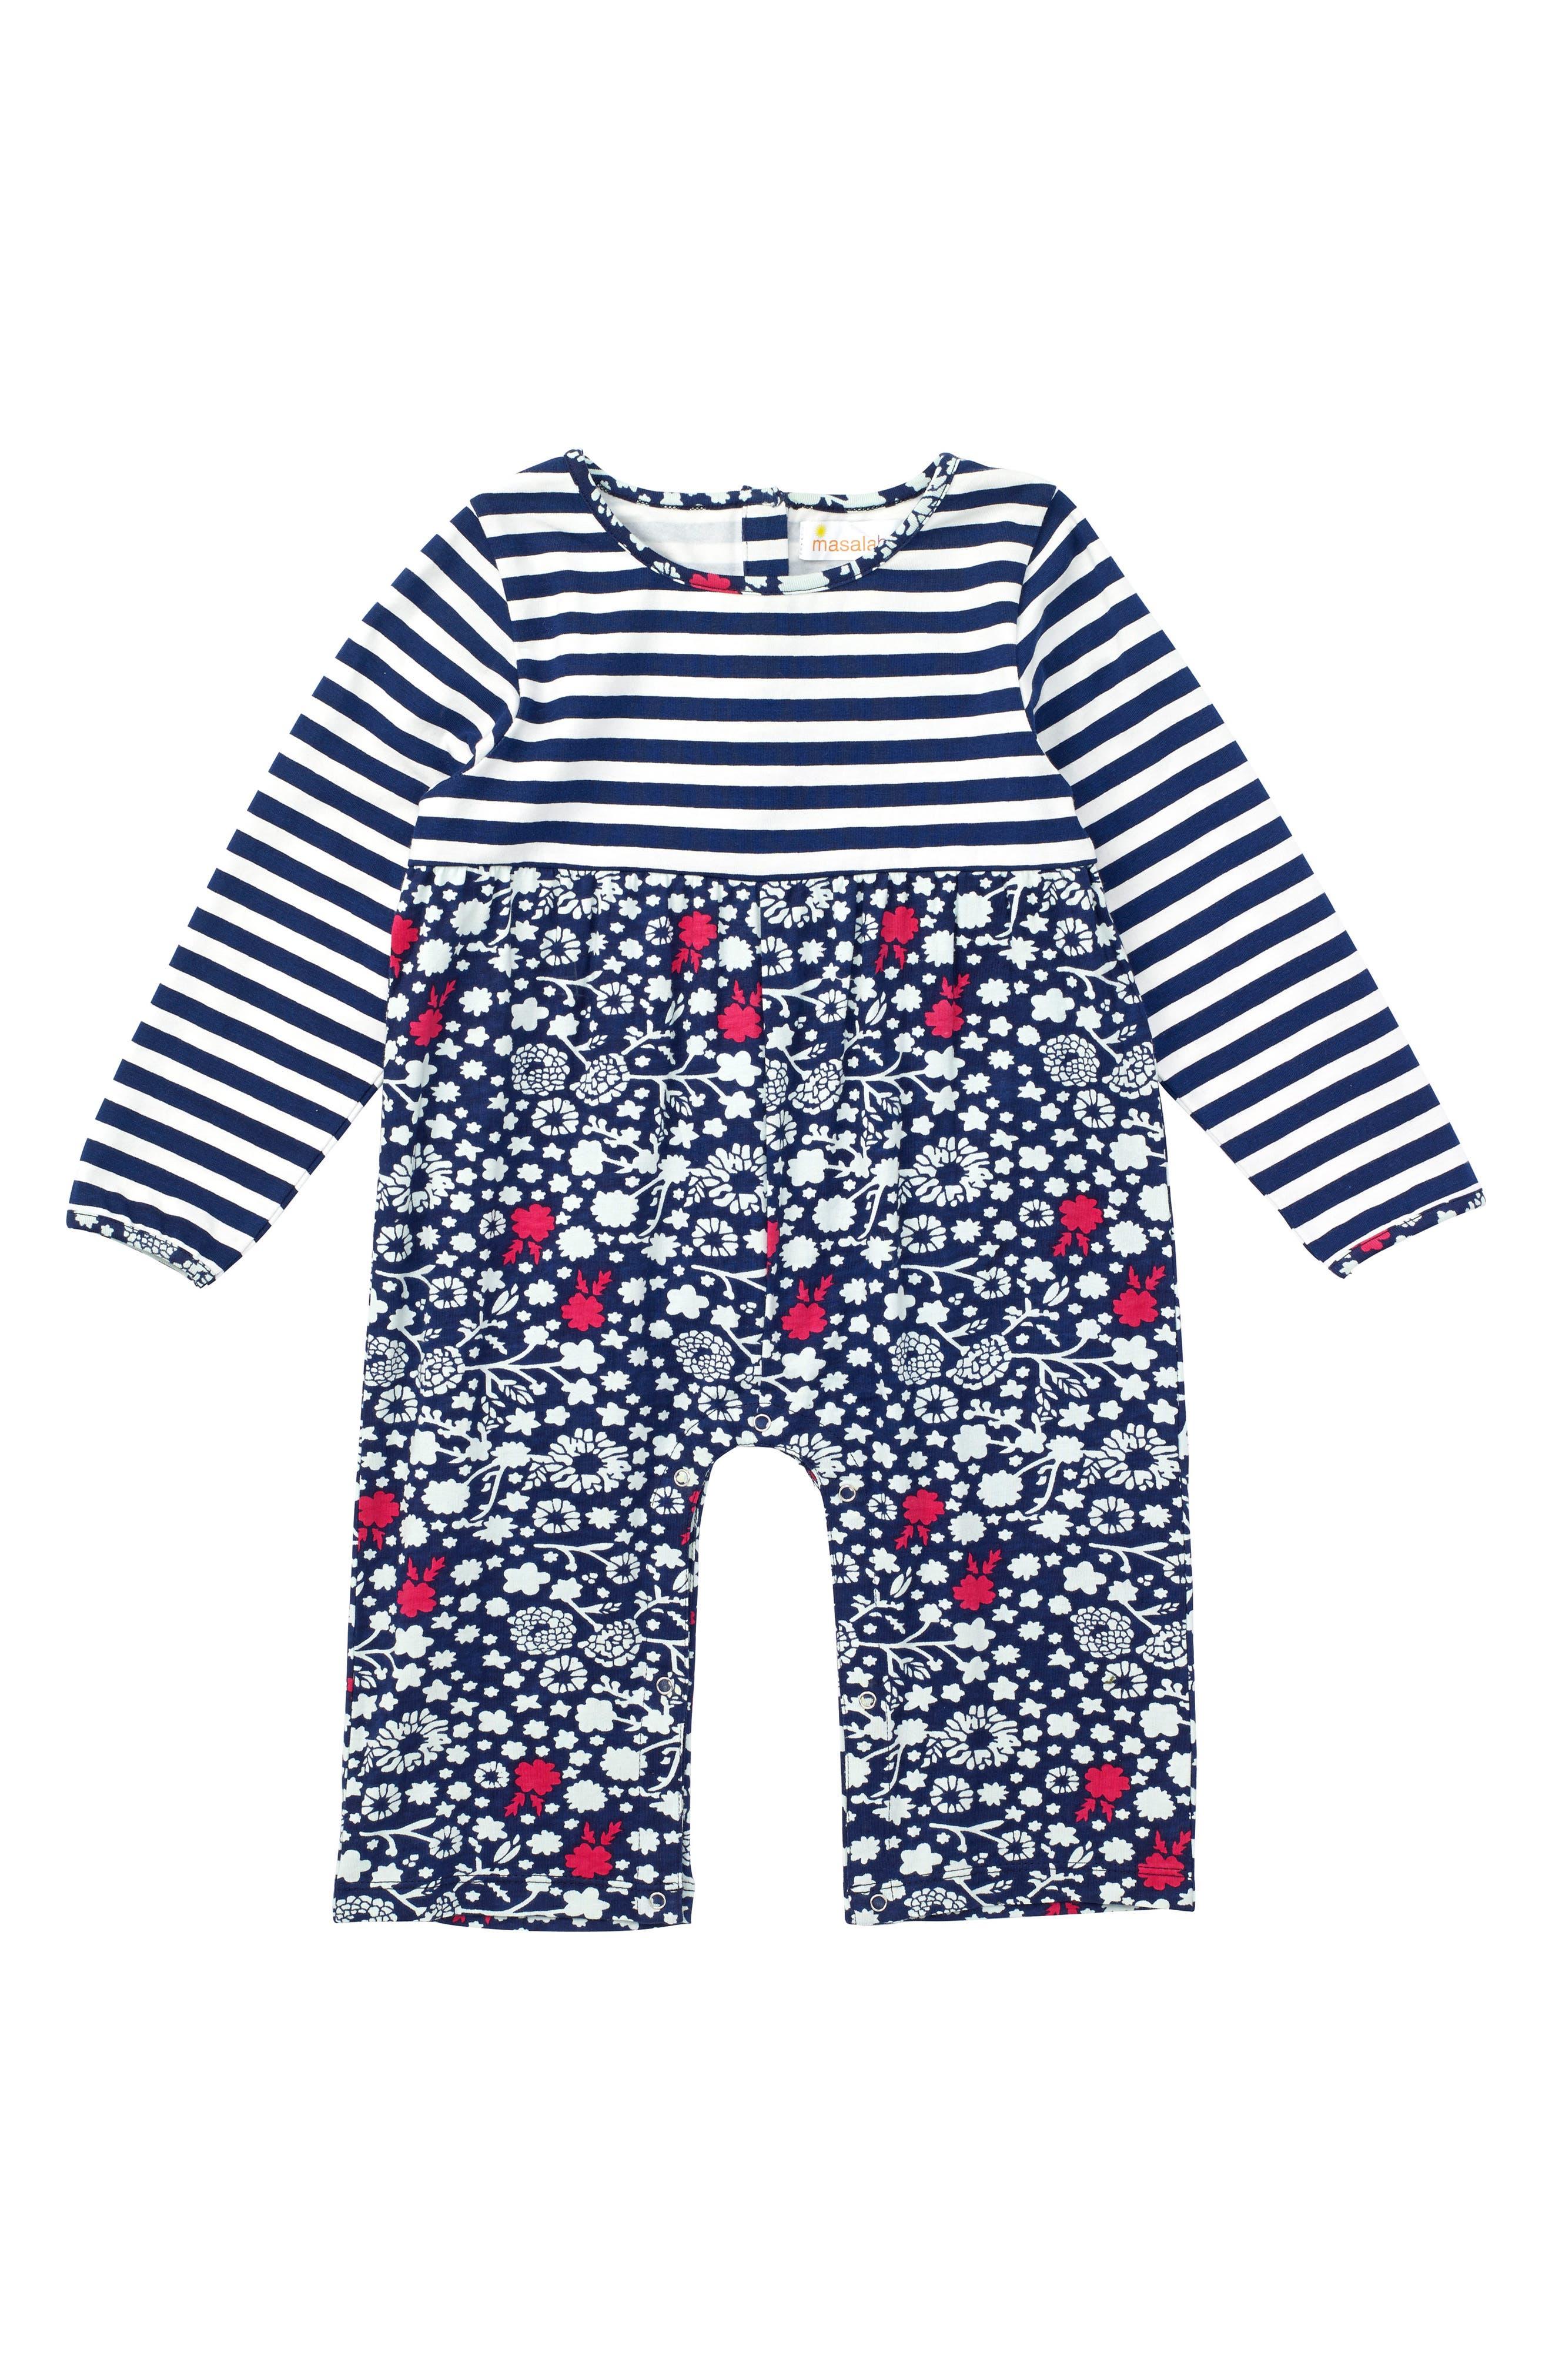 Main Image - Masalabary Chelsea Organic Cotton Romper (Baby Girls)